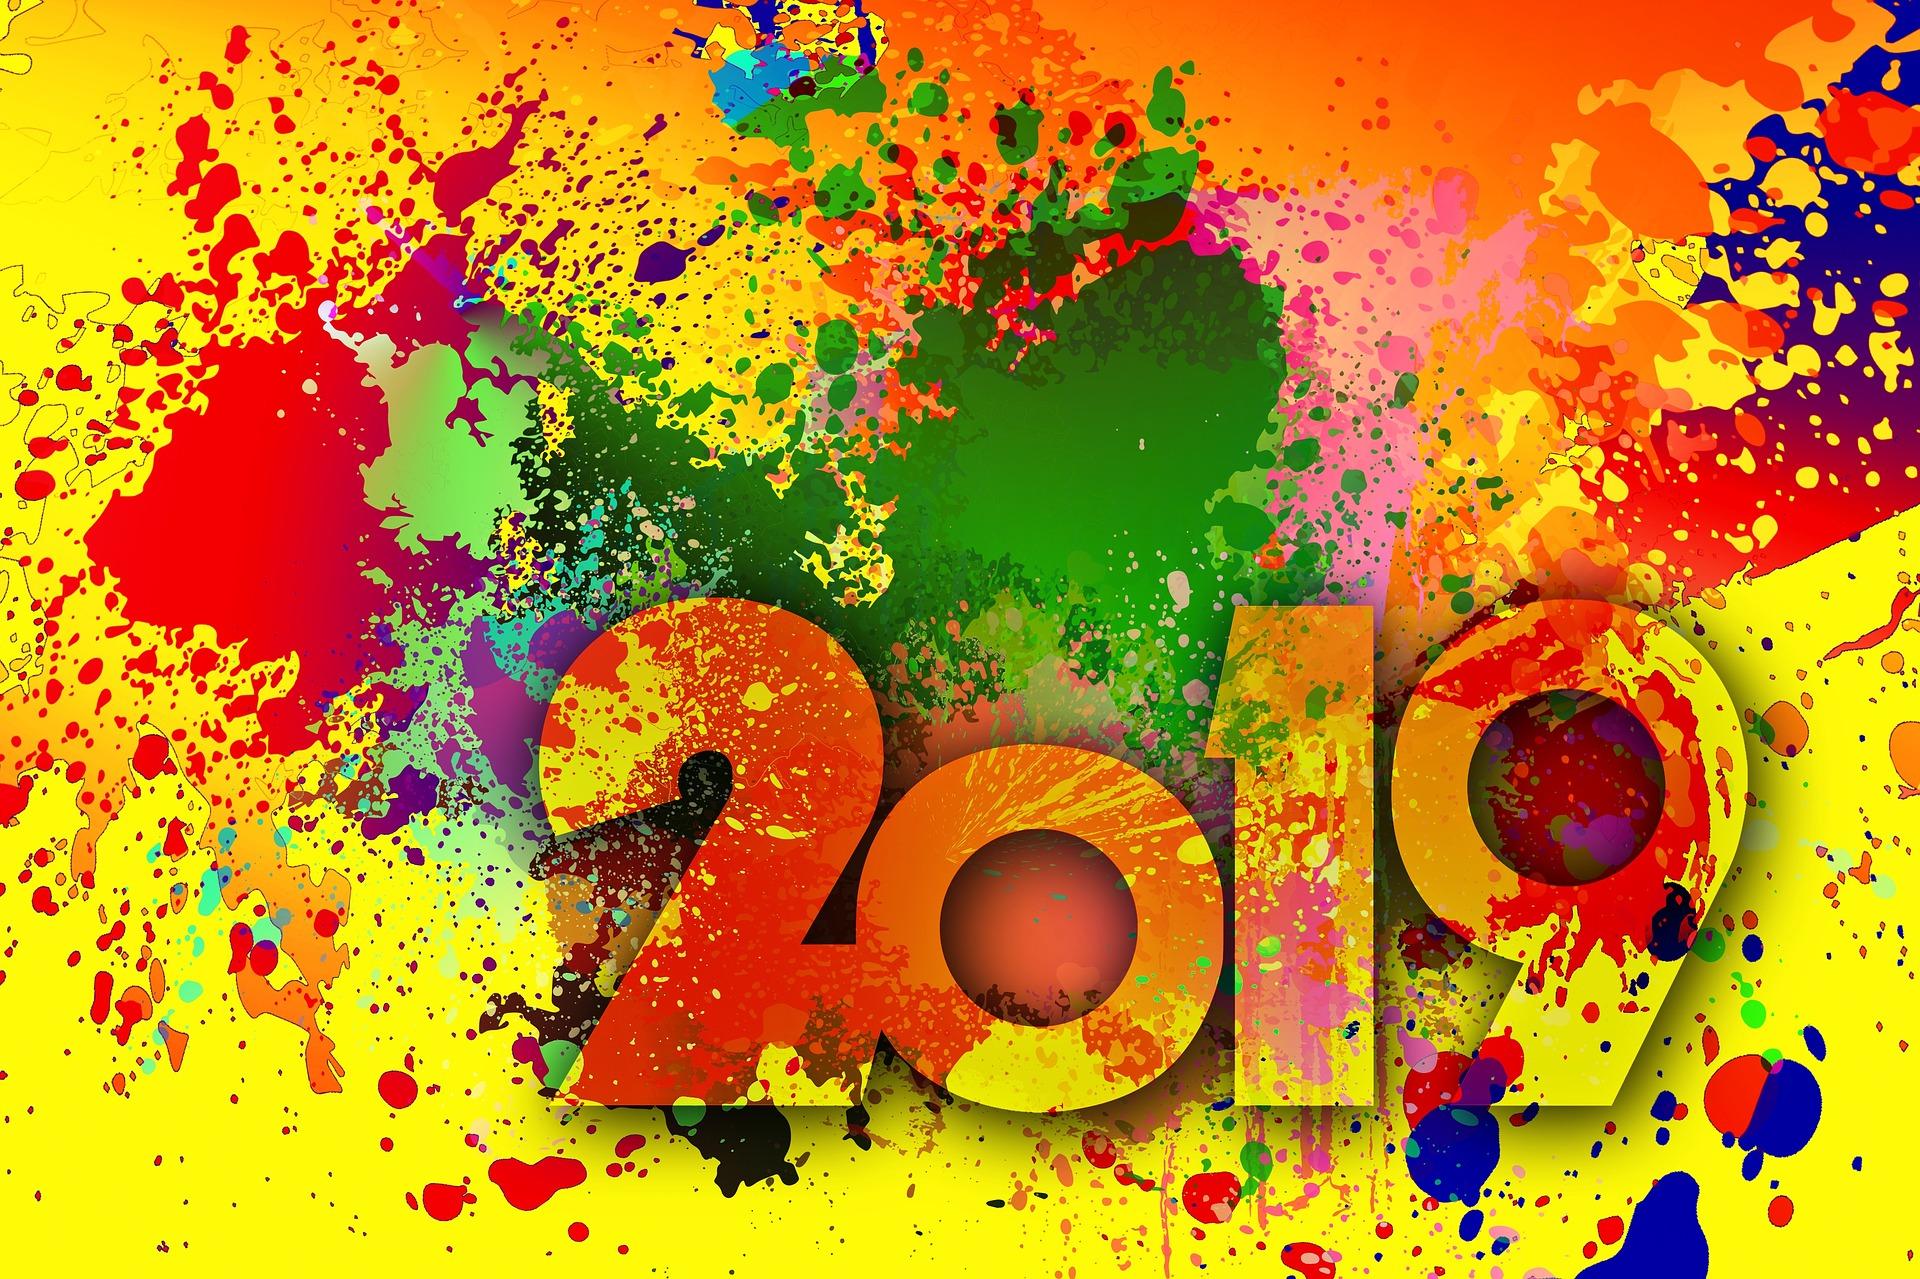 SCHIMBARI MAJORE DE VIATA - sfatulaprintilor.ro - pixabay_com - new-years-day-3857456_1920